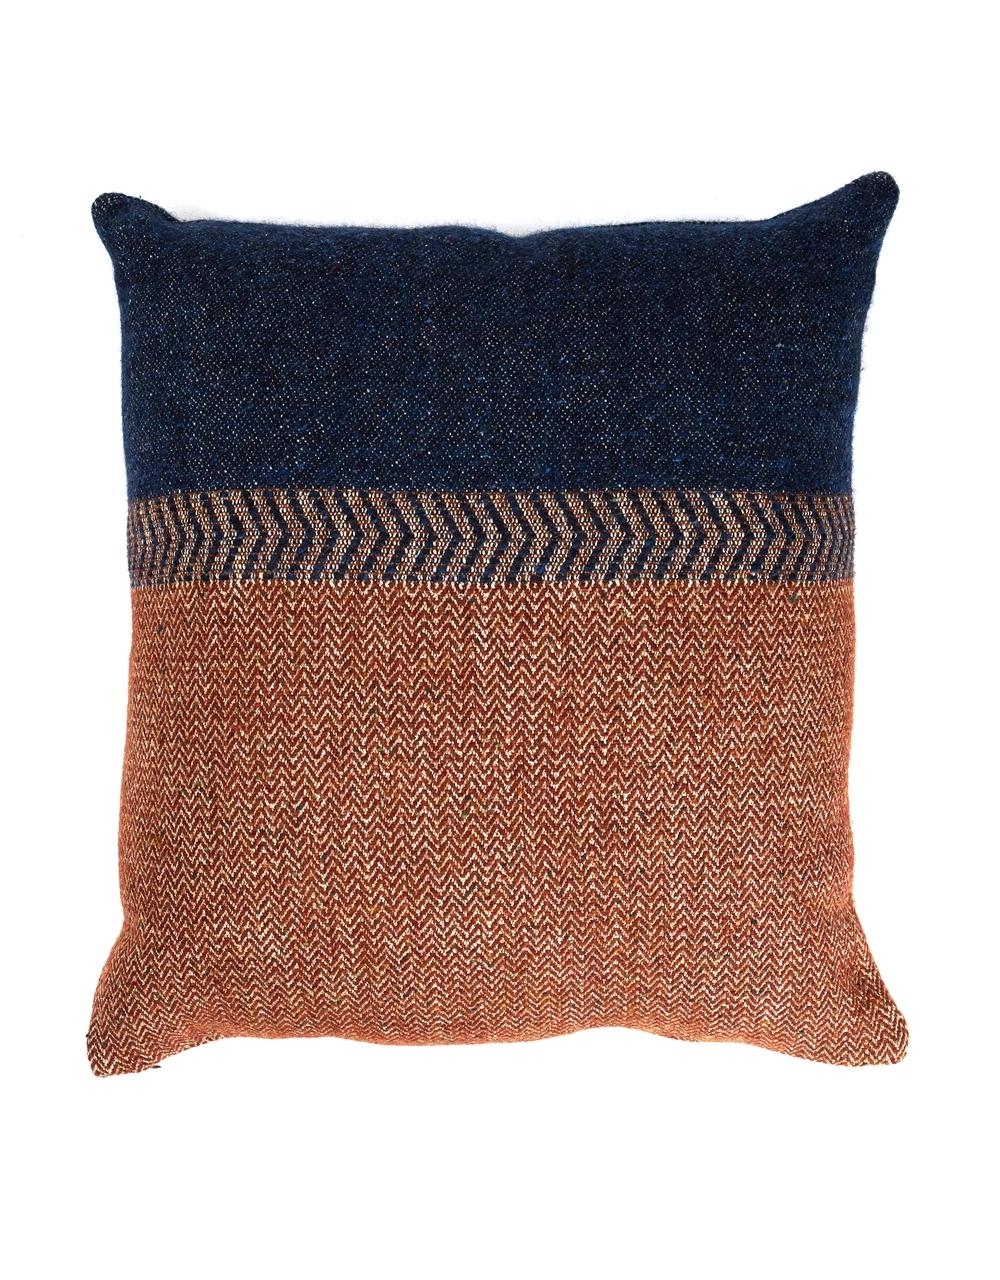 25x25 decorative pillow covers online